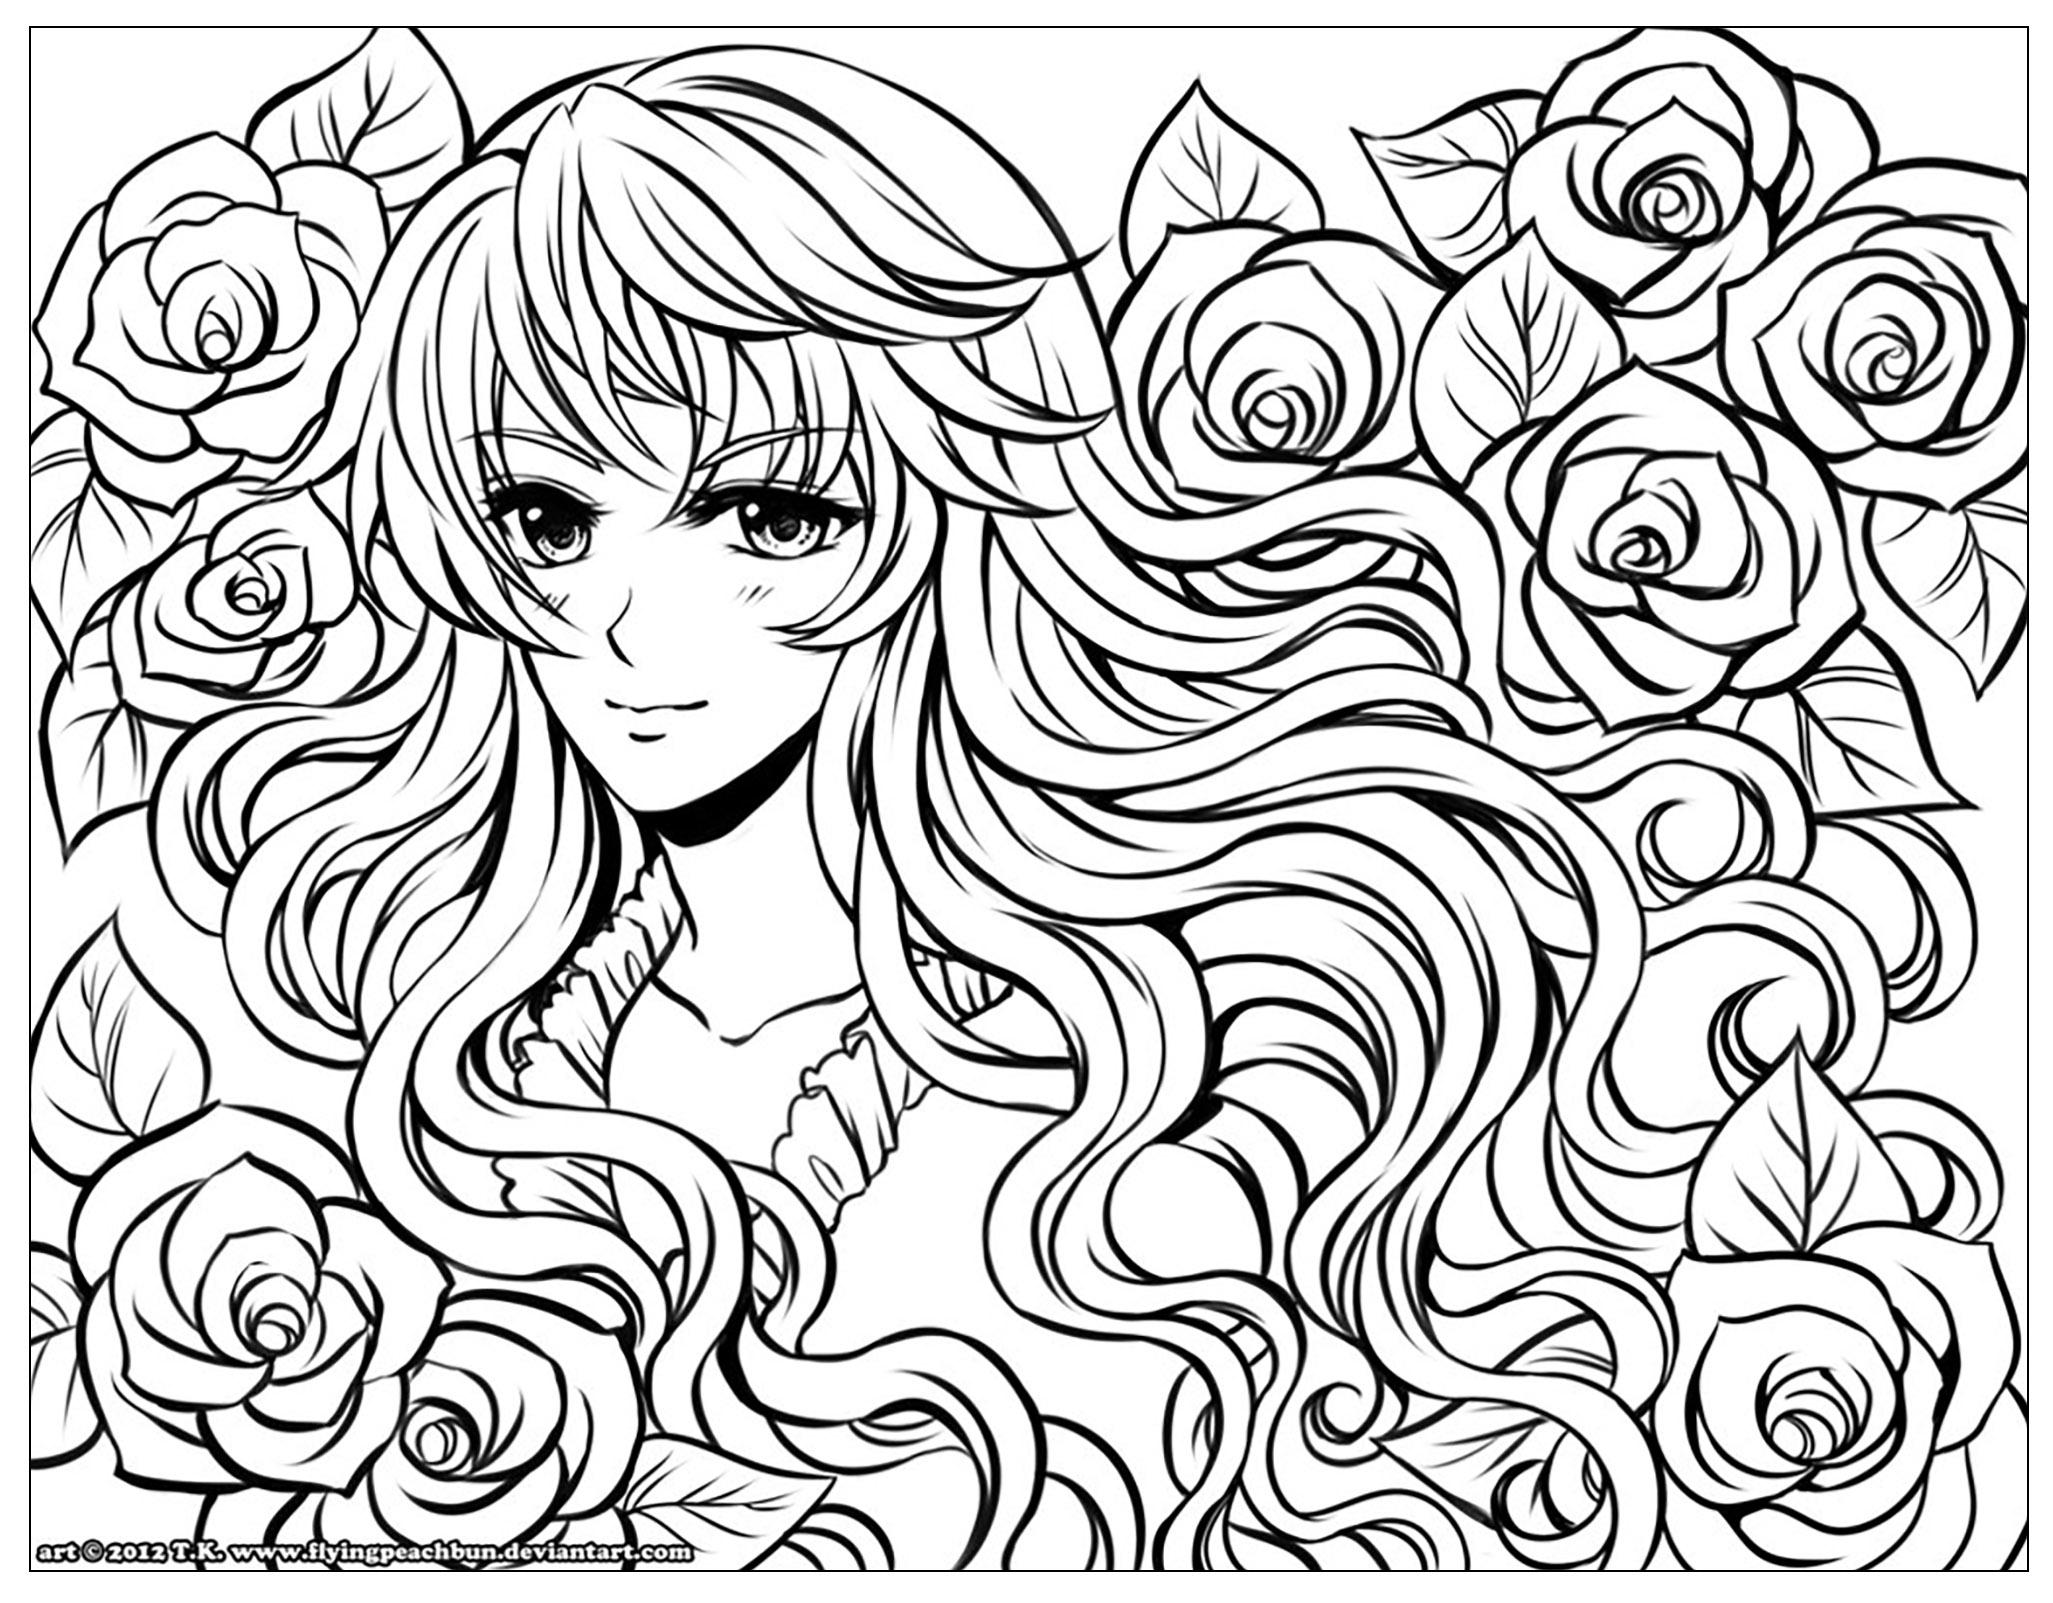 2053x1603 Manga Girl With Flowers